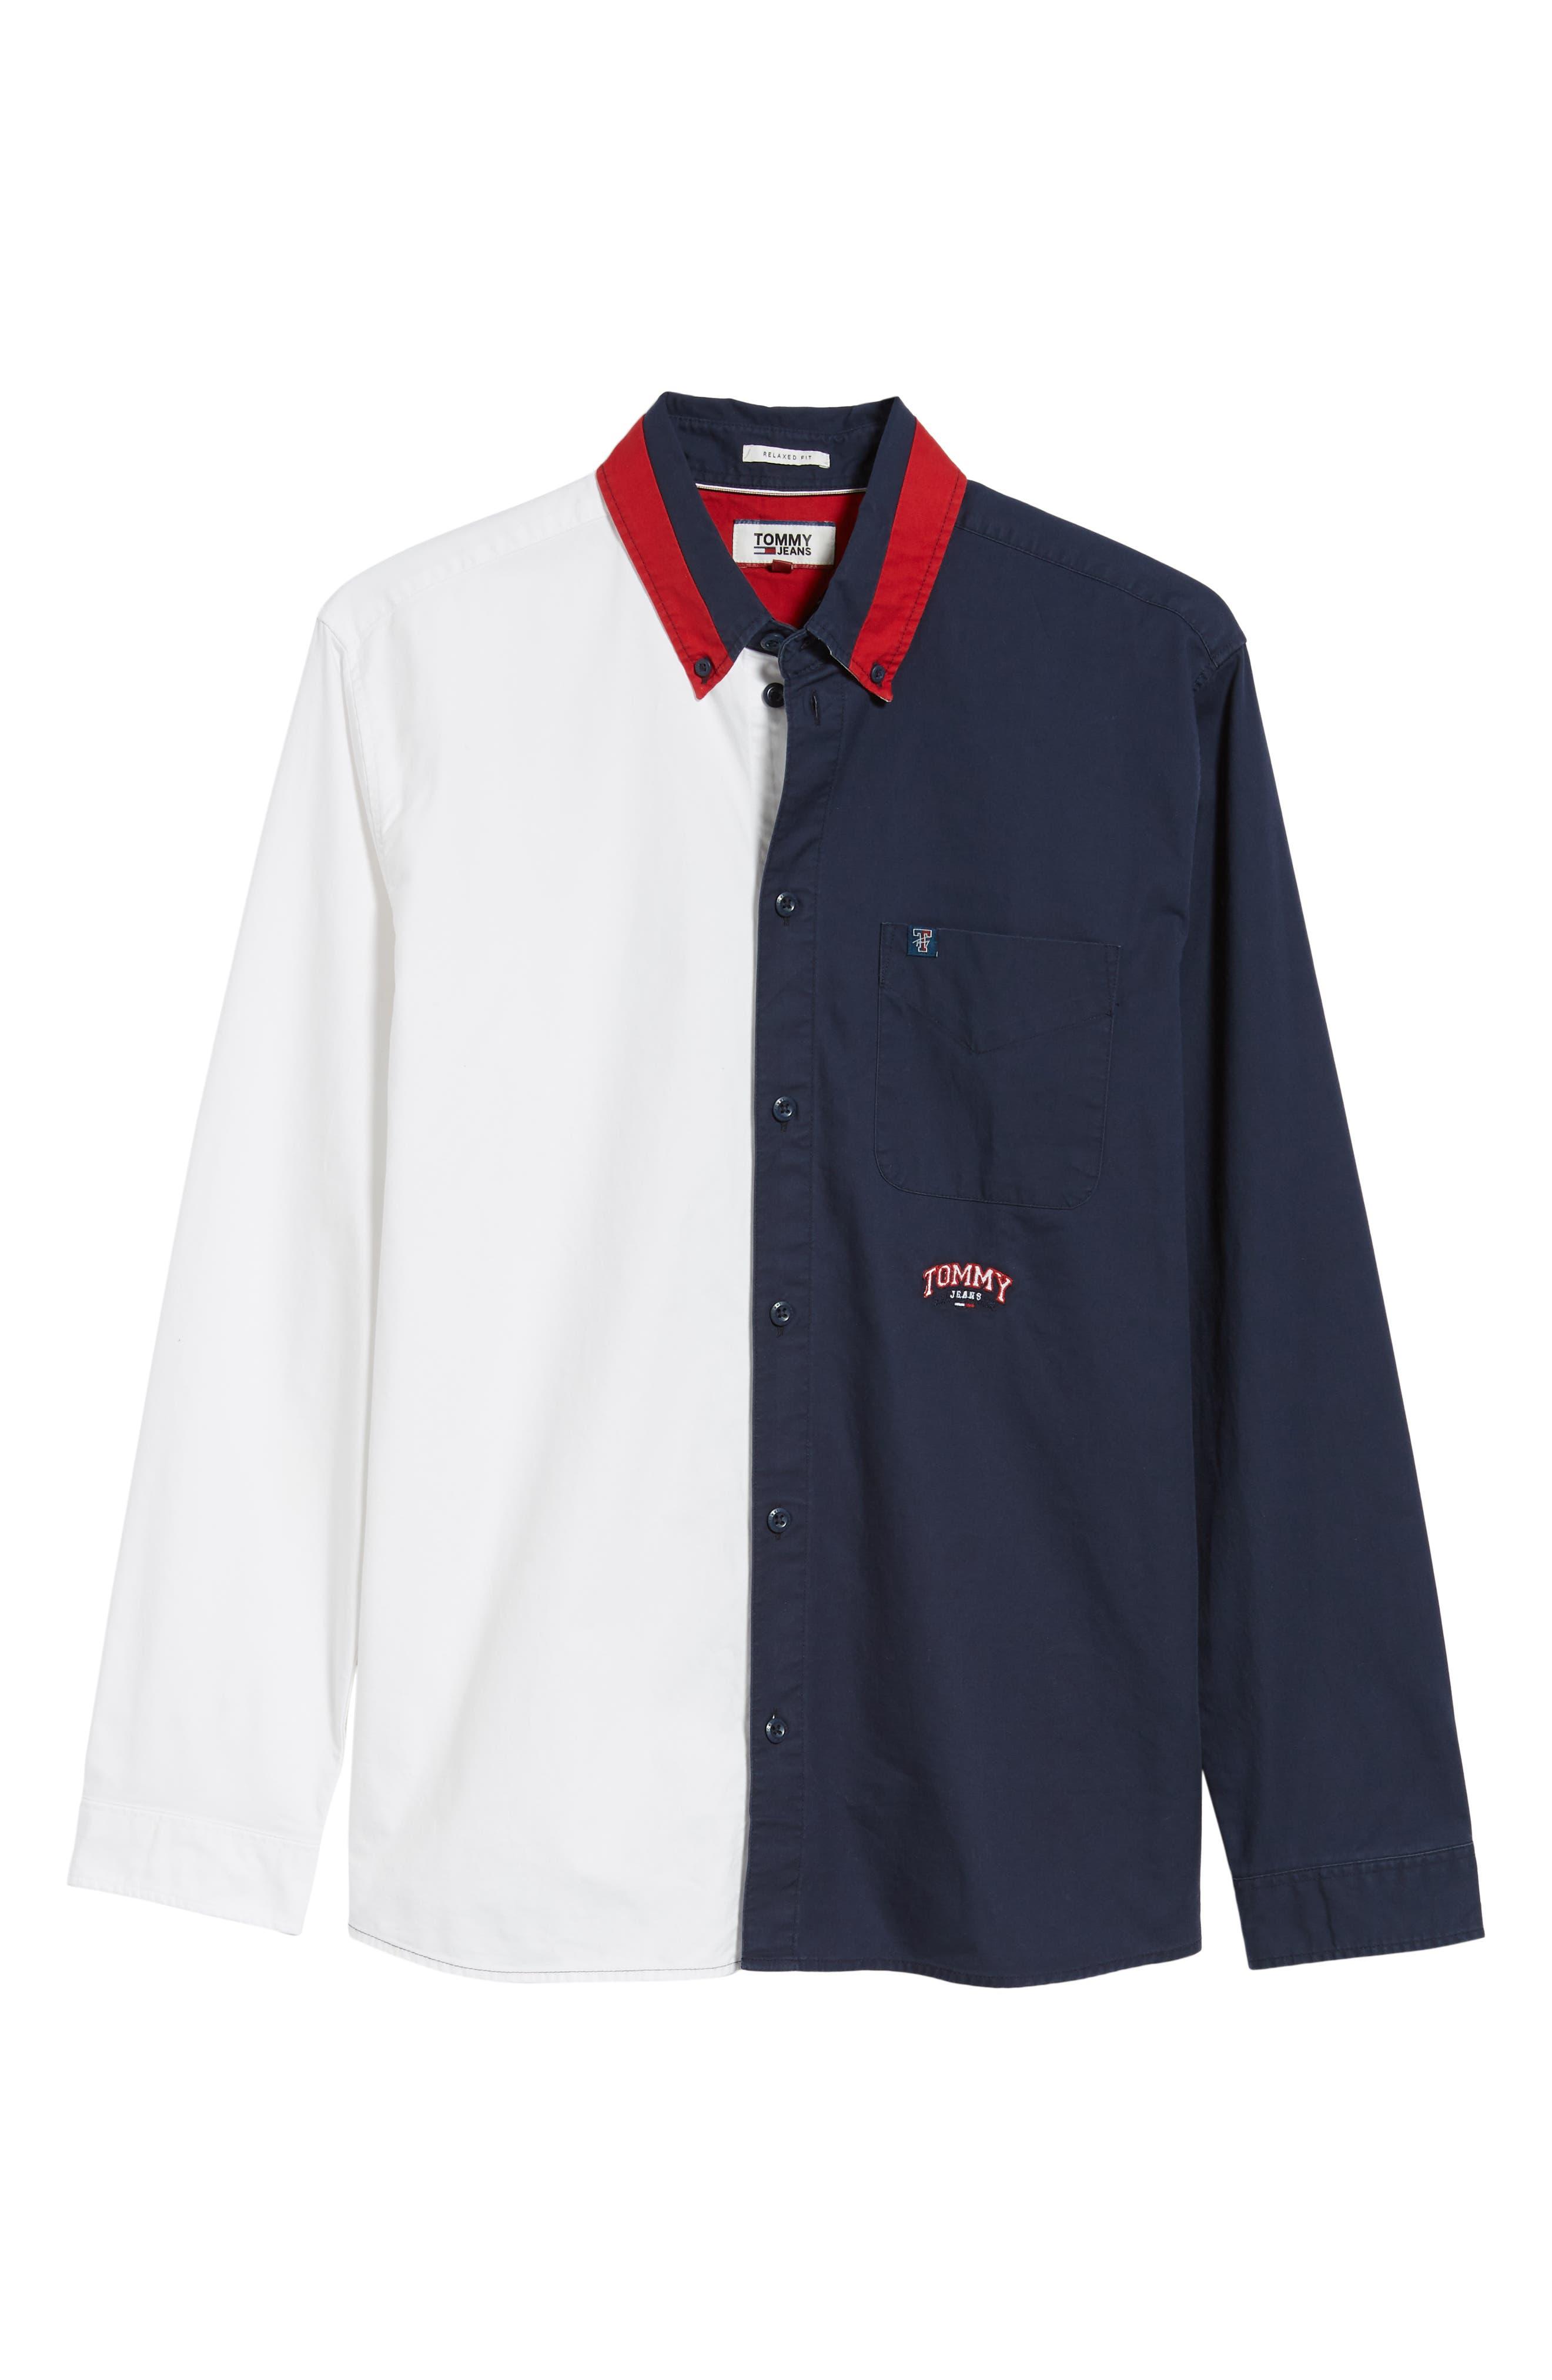 Half & Half Shirt,                             Alternate thumbnail 5, color,                             CLASSIC WHITE / BLACK IRIS